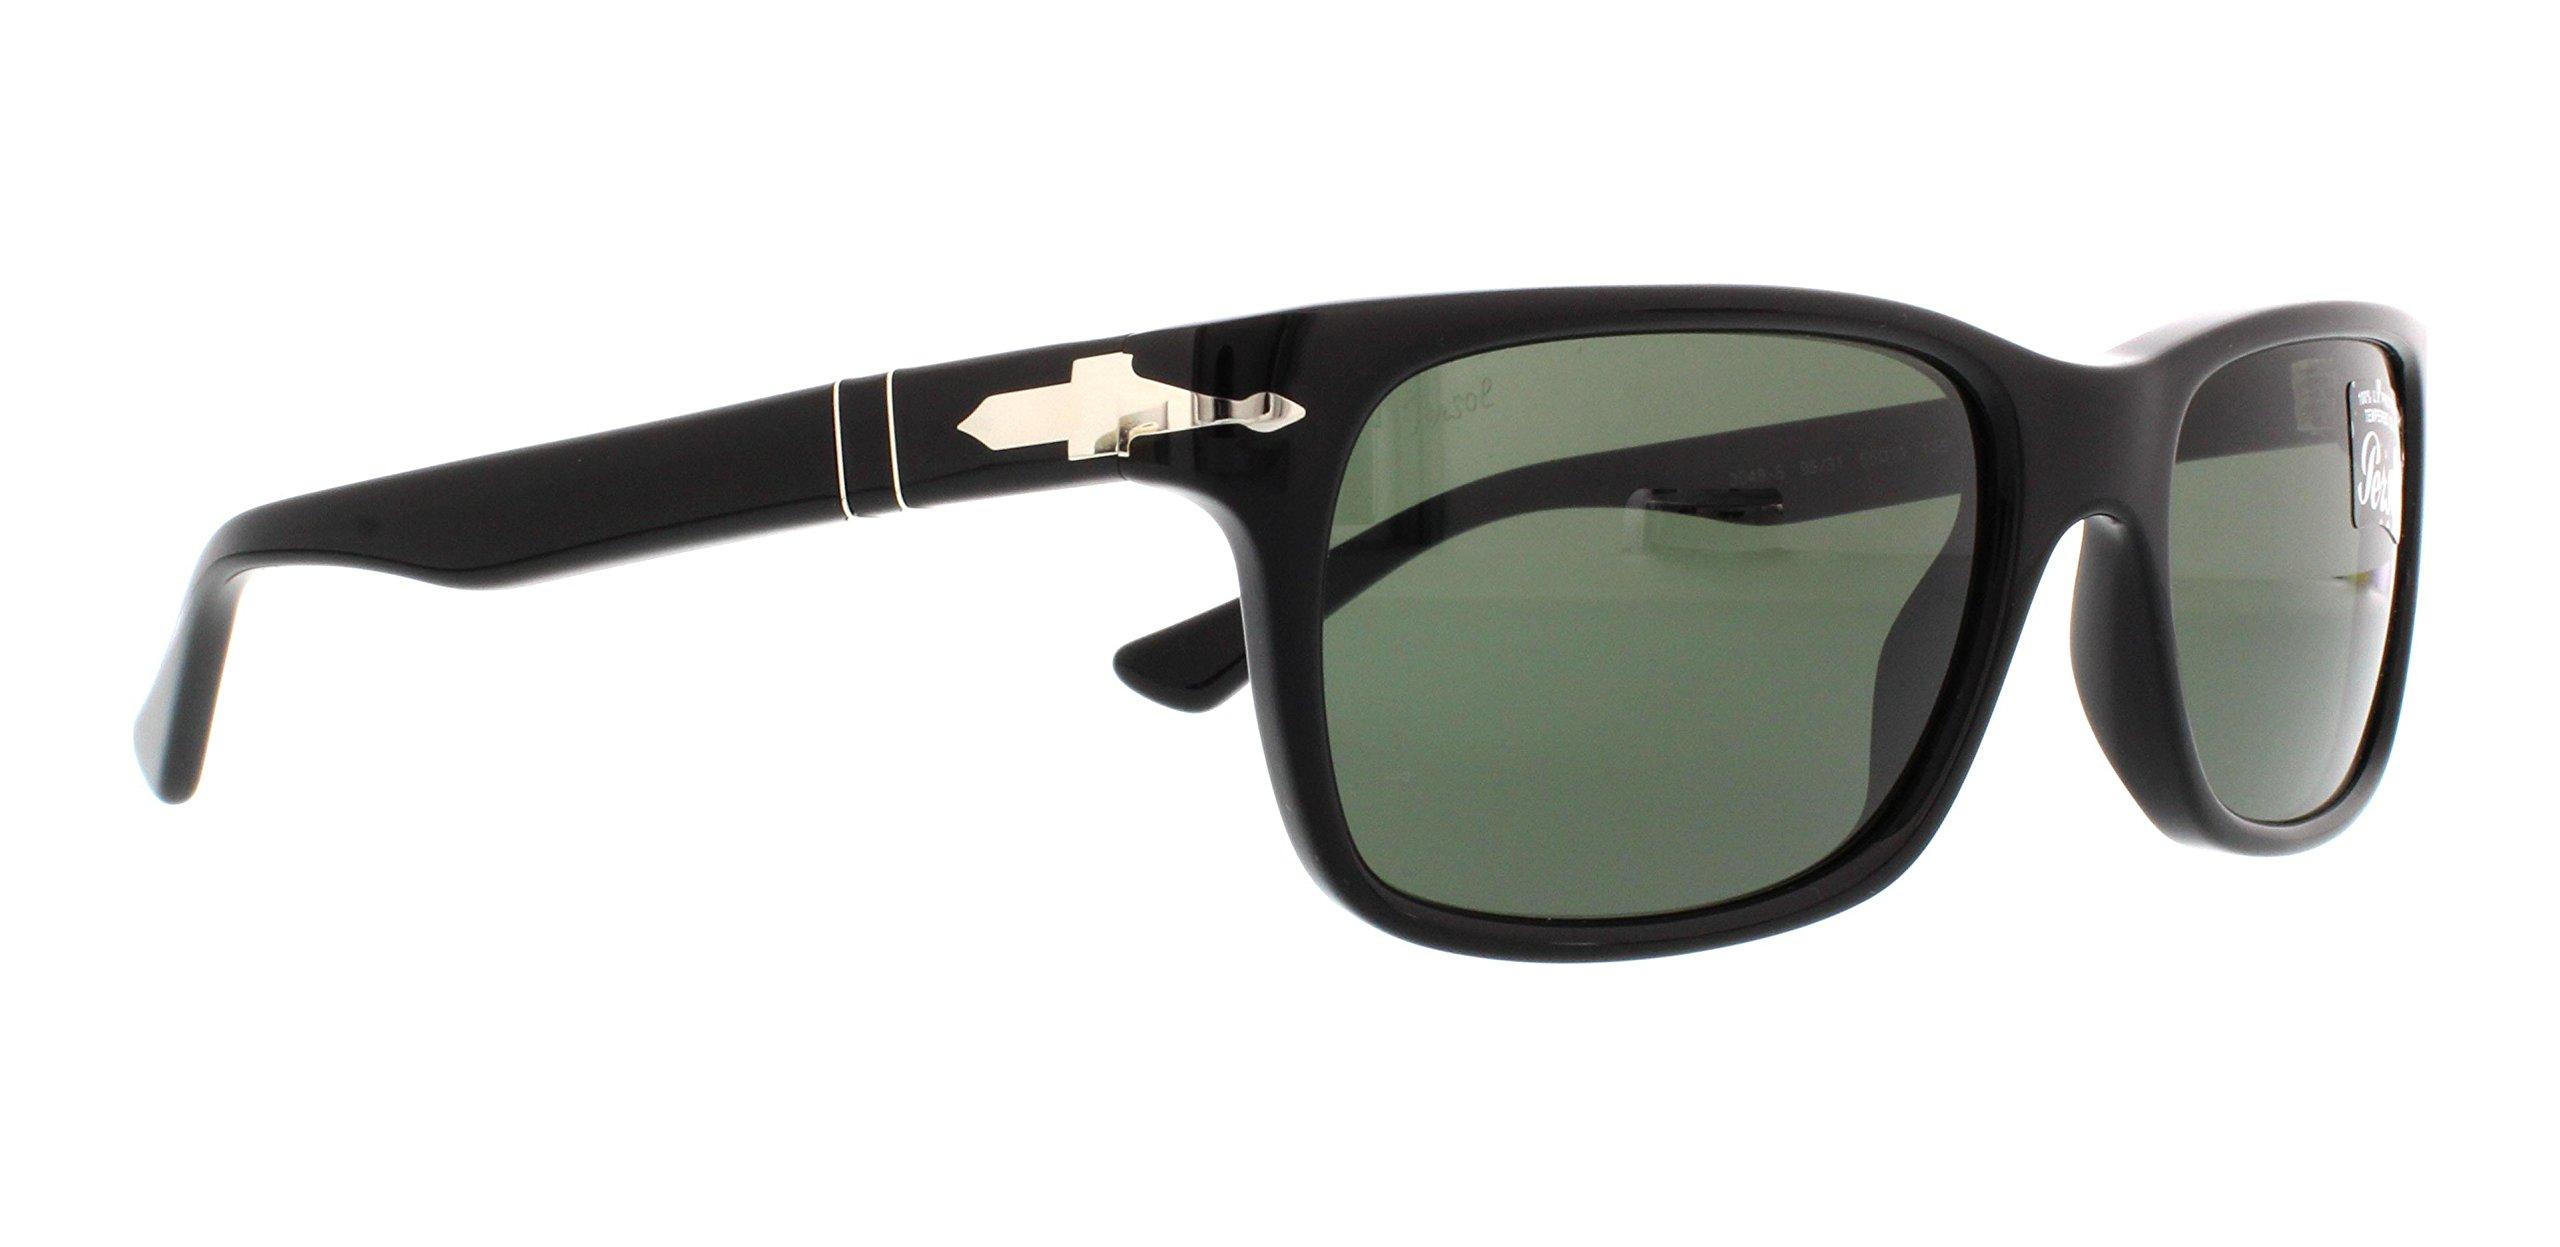 Persol Men's PO3048S Sunglasses Black/Crystal Green 55mm